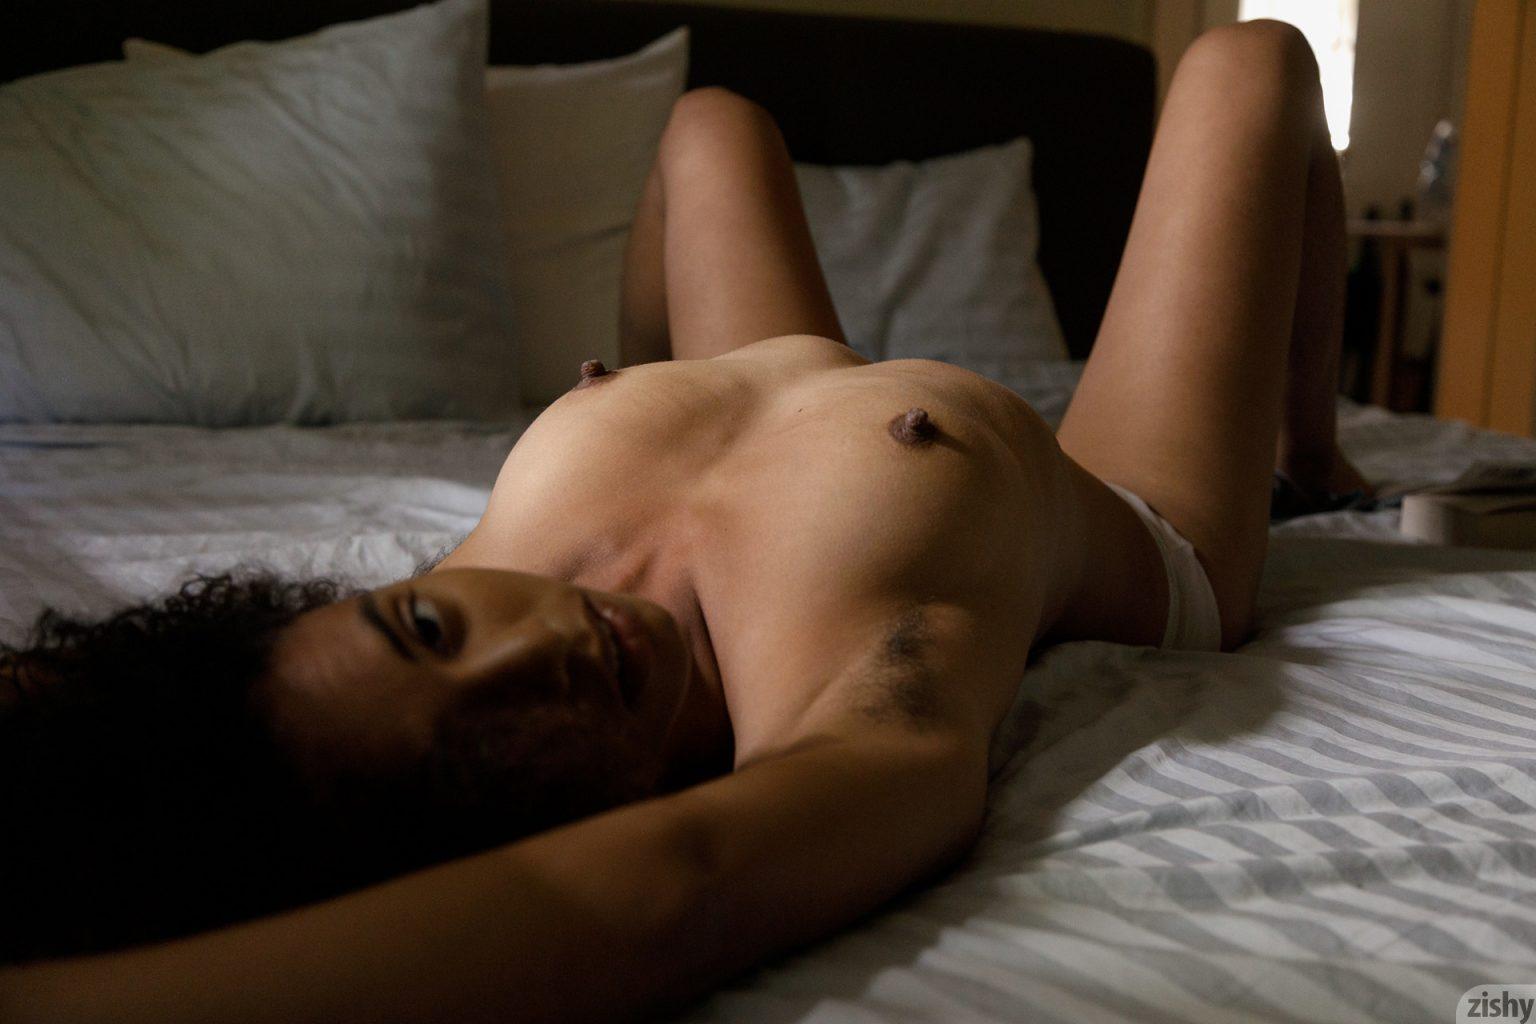 Hot females tophatal's blog